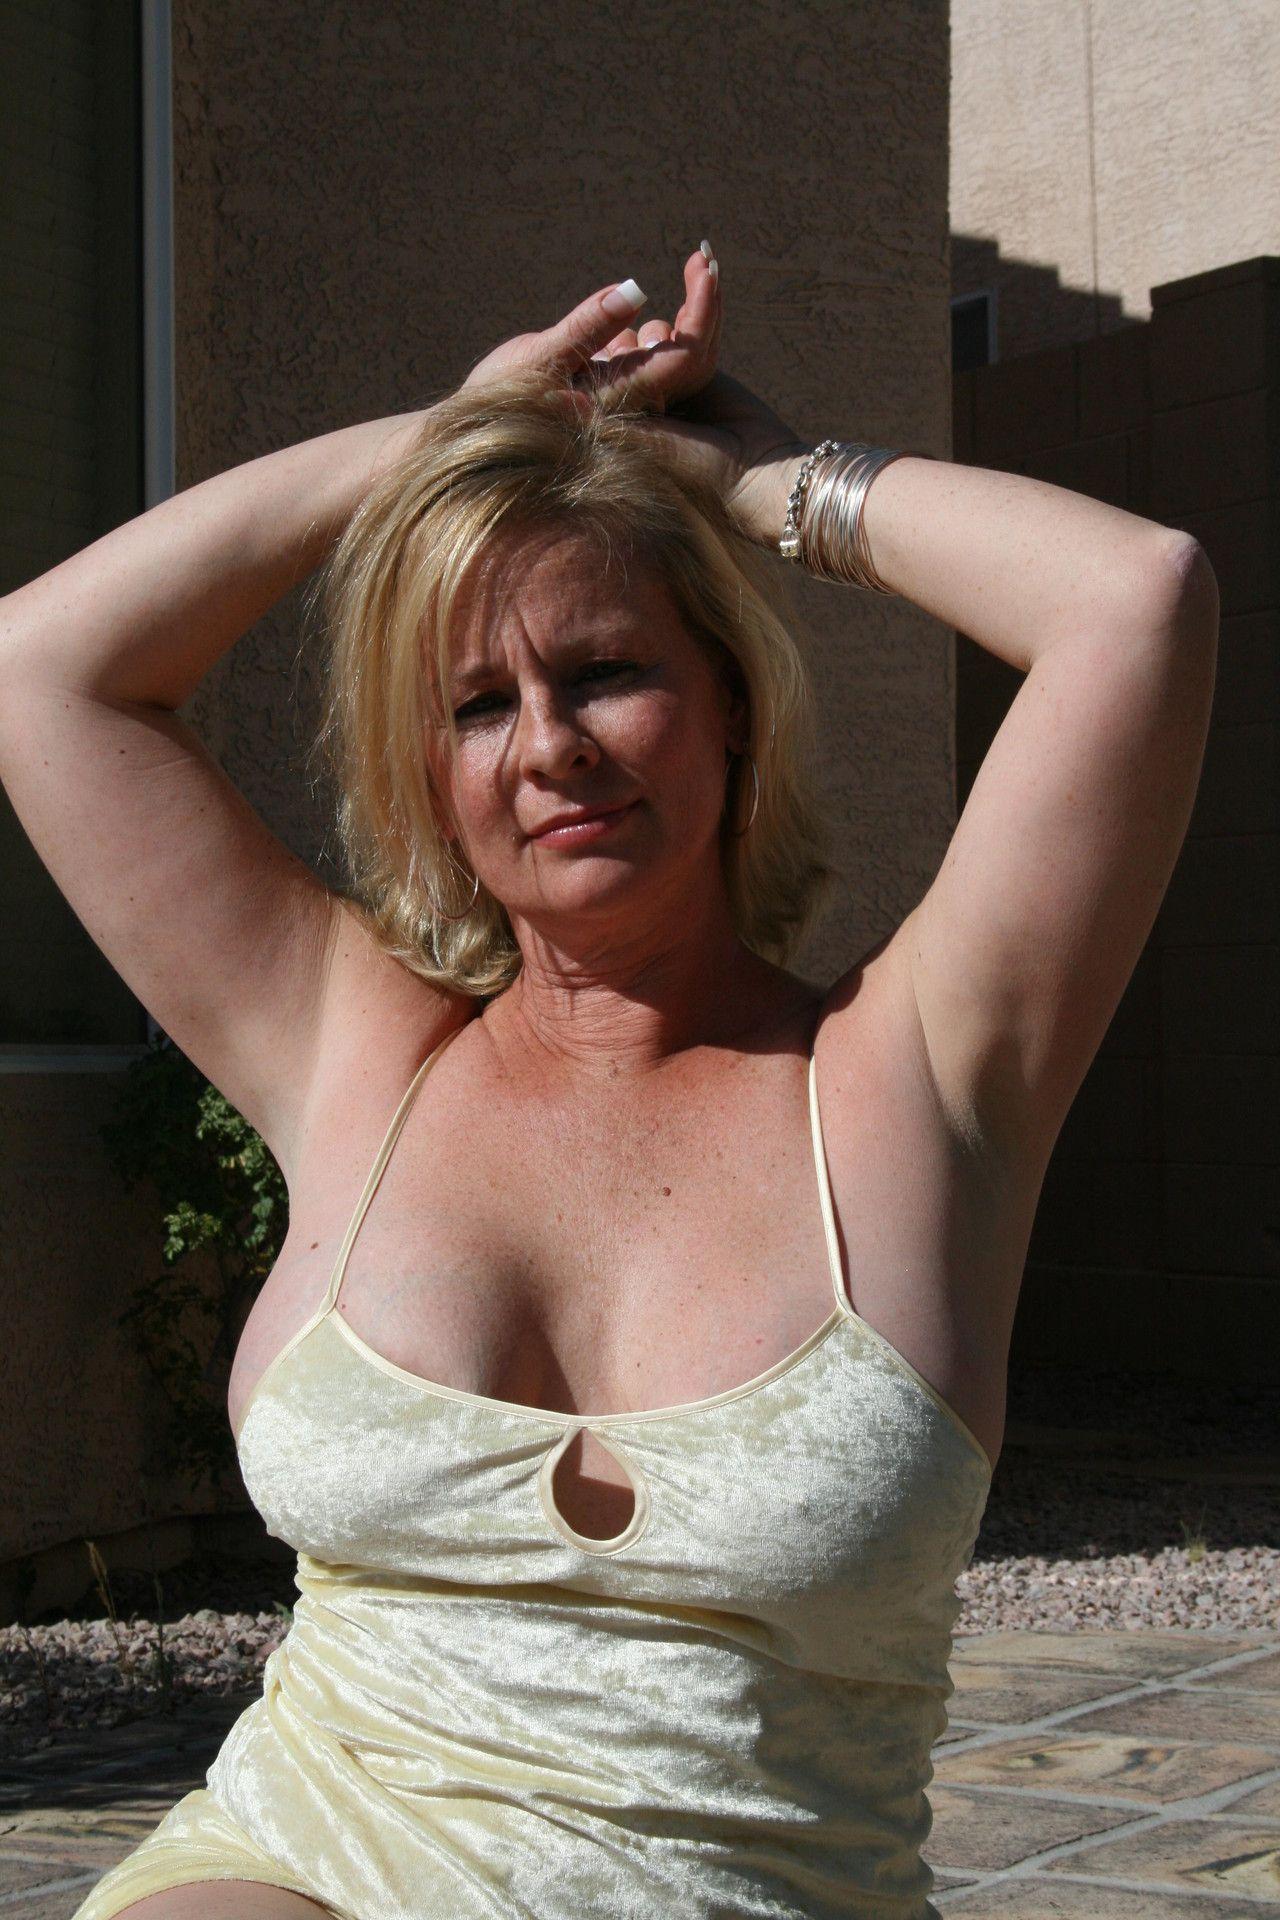 cherche femme sur whatsapp Brive-la-Gaillarde